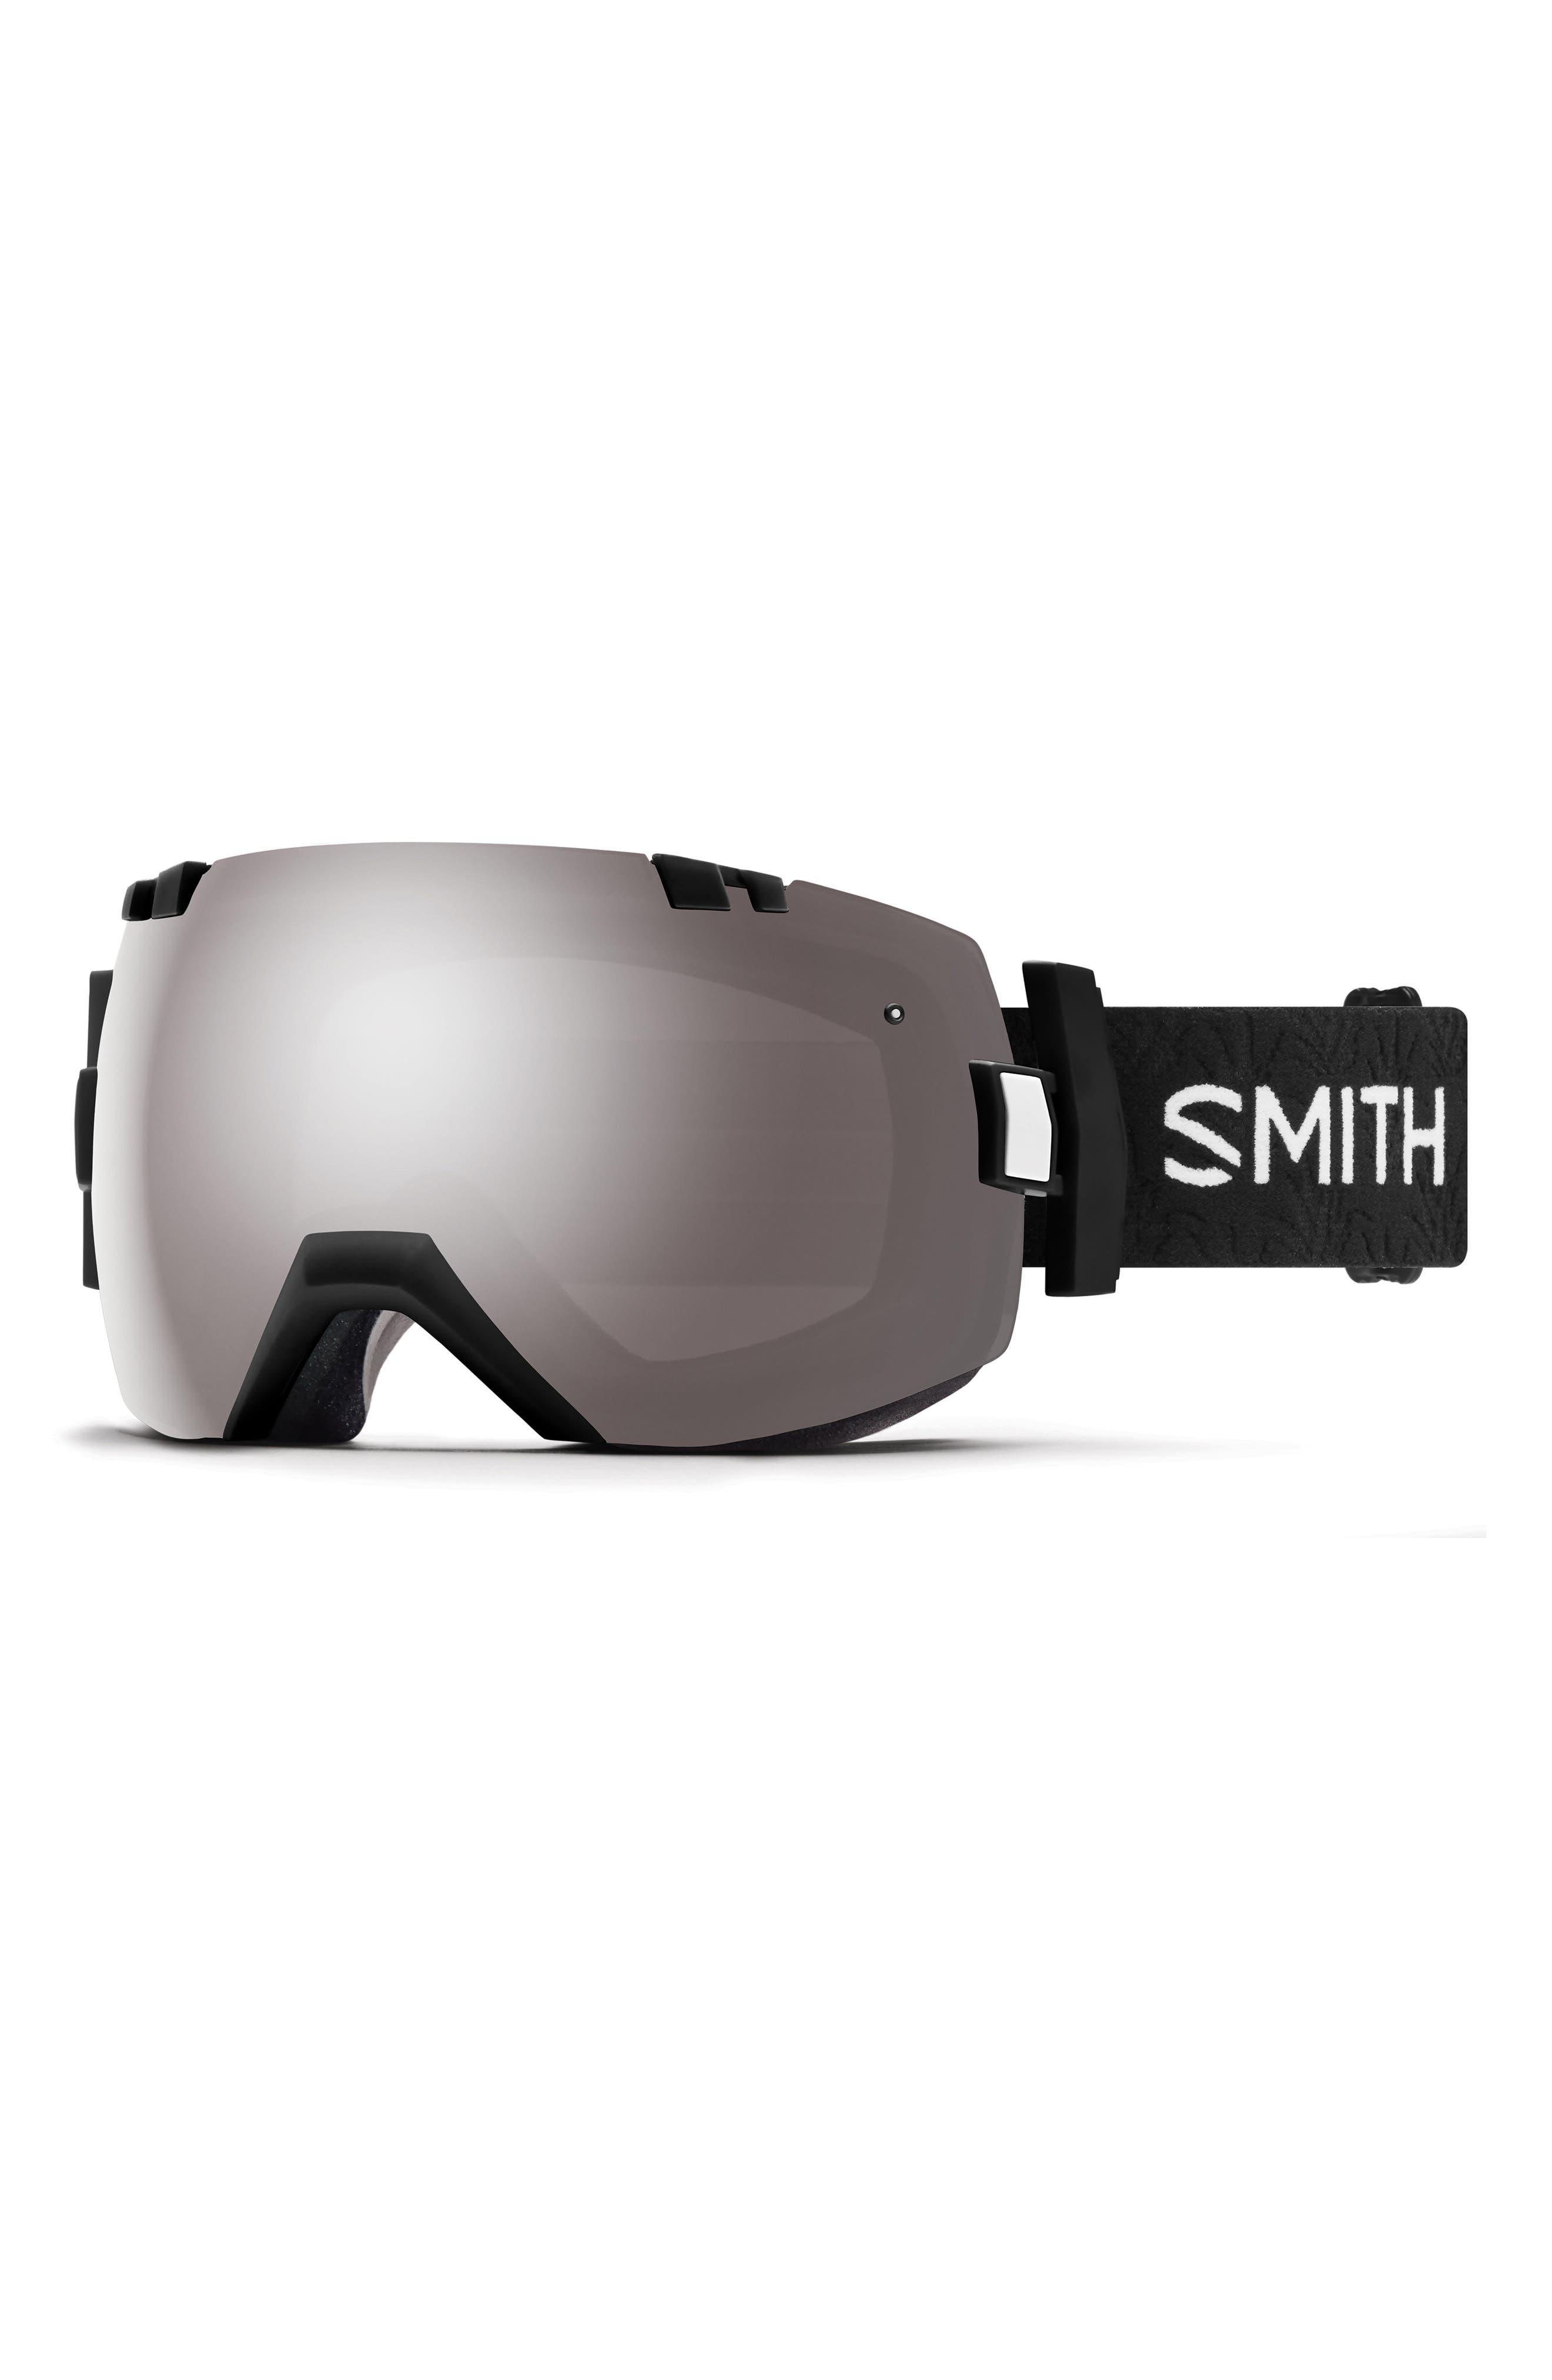 I/OX 205mm Chromapop Snow Goggles,                             Main thumbnail 1, color,                             001